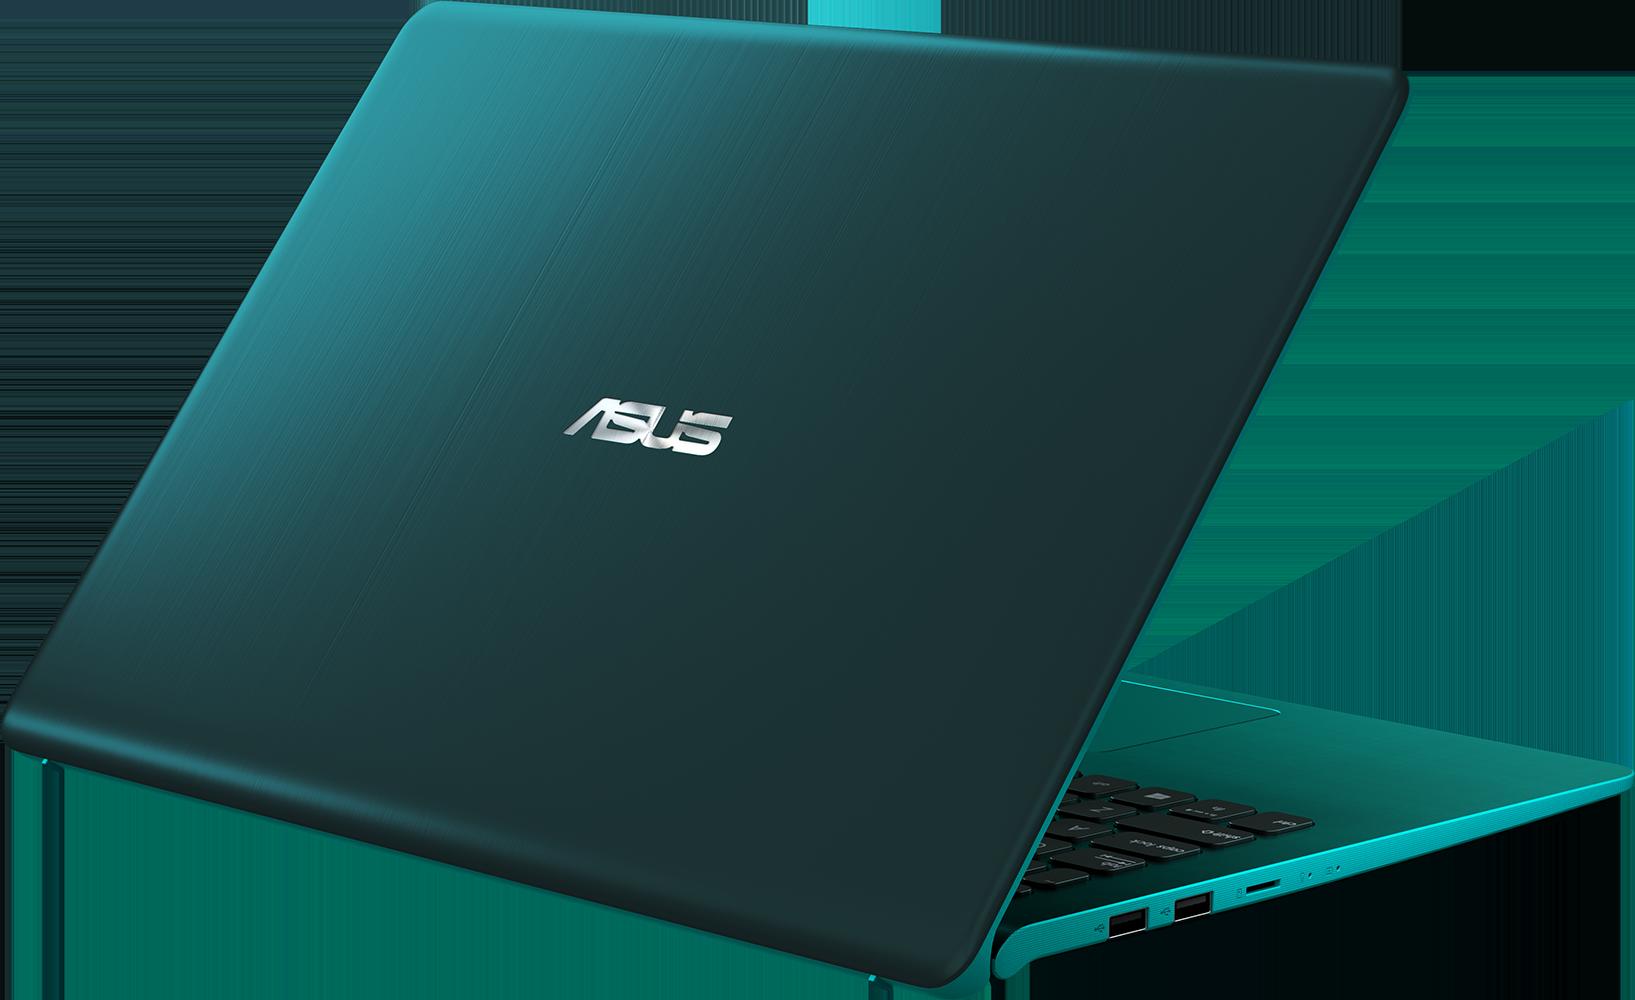 Ноутбук Asus VivoBook S15 S530FN-BQ347T (90NB0K41-M05730) зеленый